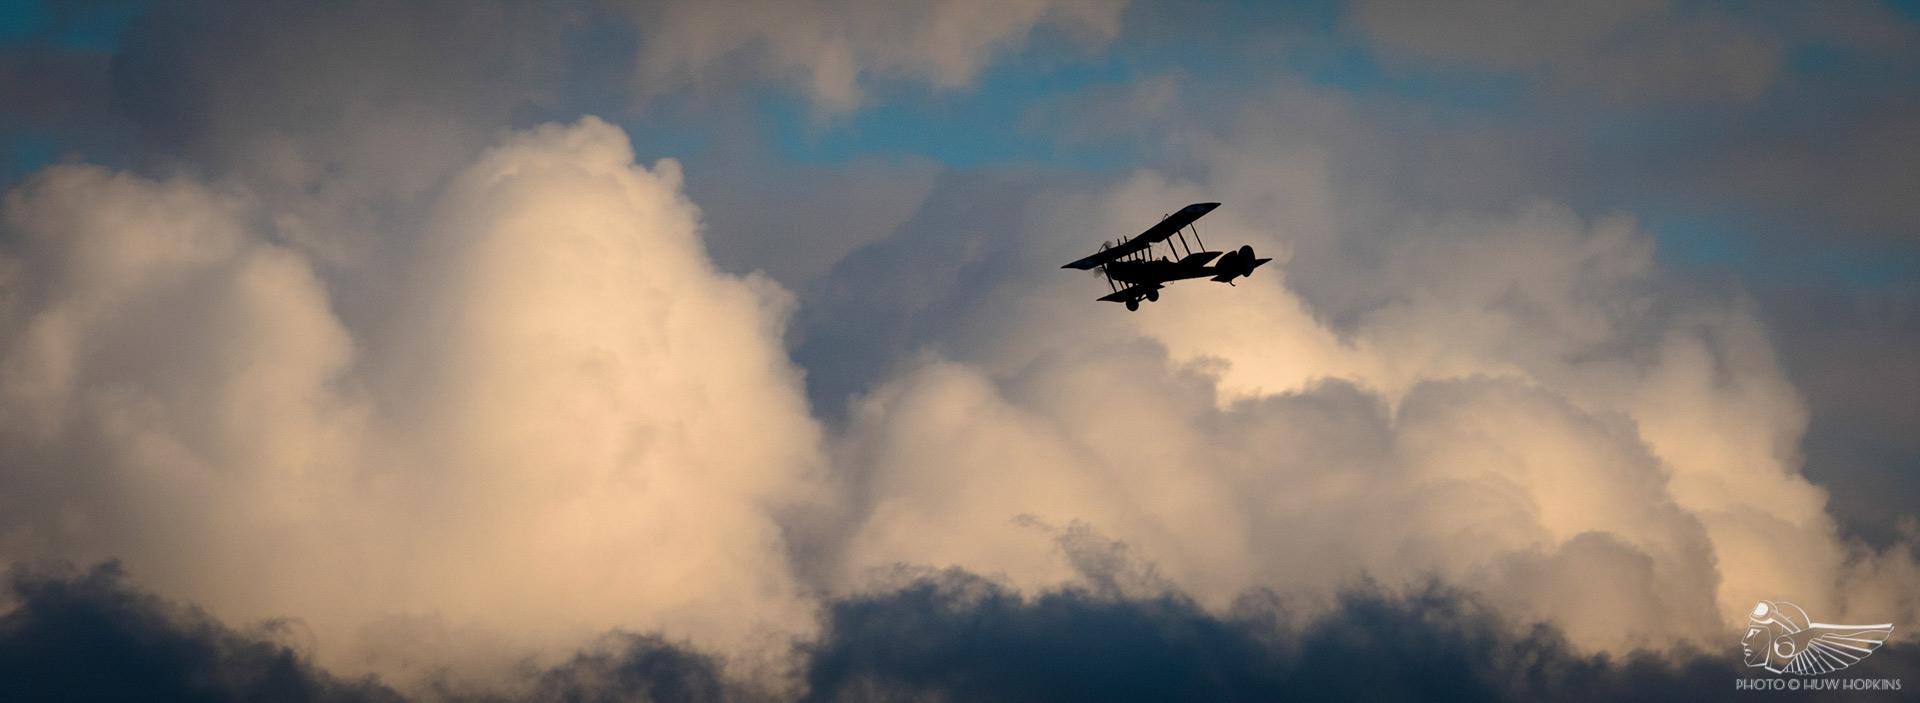 WWI Aviation Heritage Trust reveals ambitious expansion plans